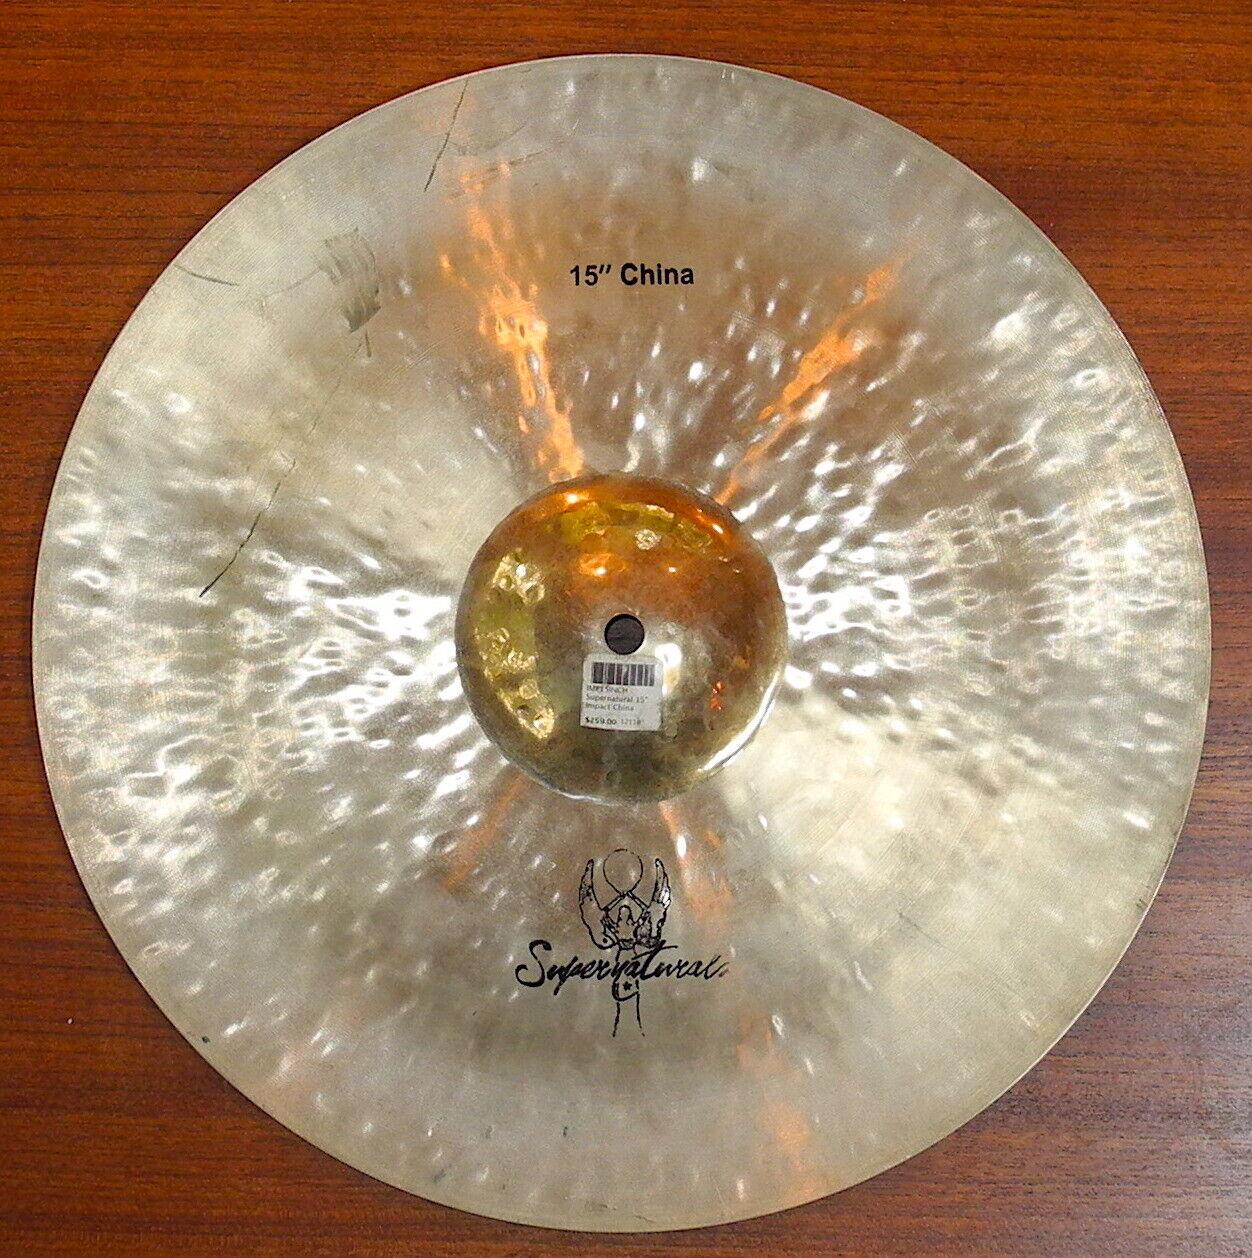 Supernaturals 15 Inch Impact China Drum Cymbal - $79.99